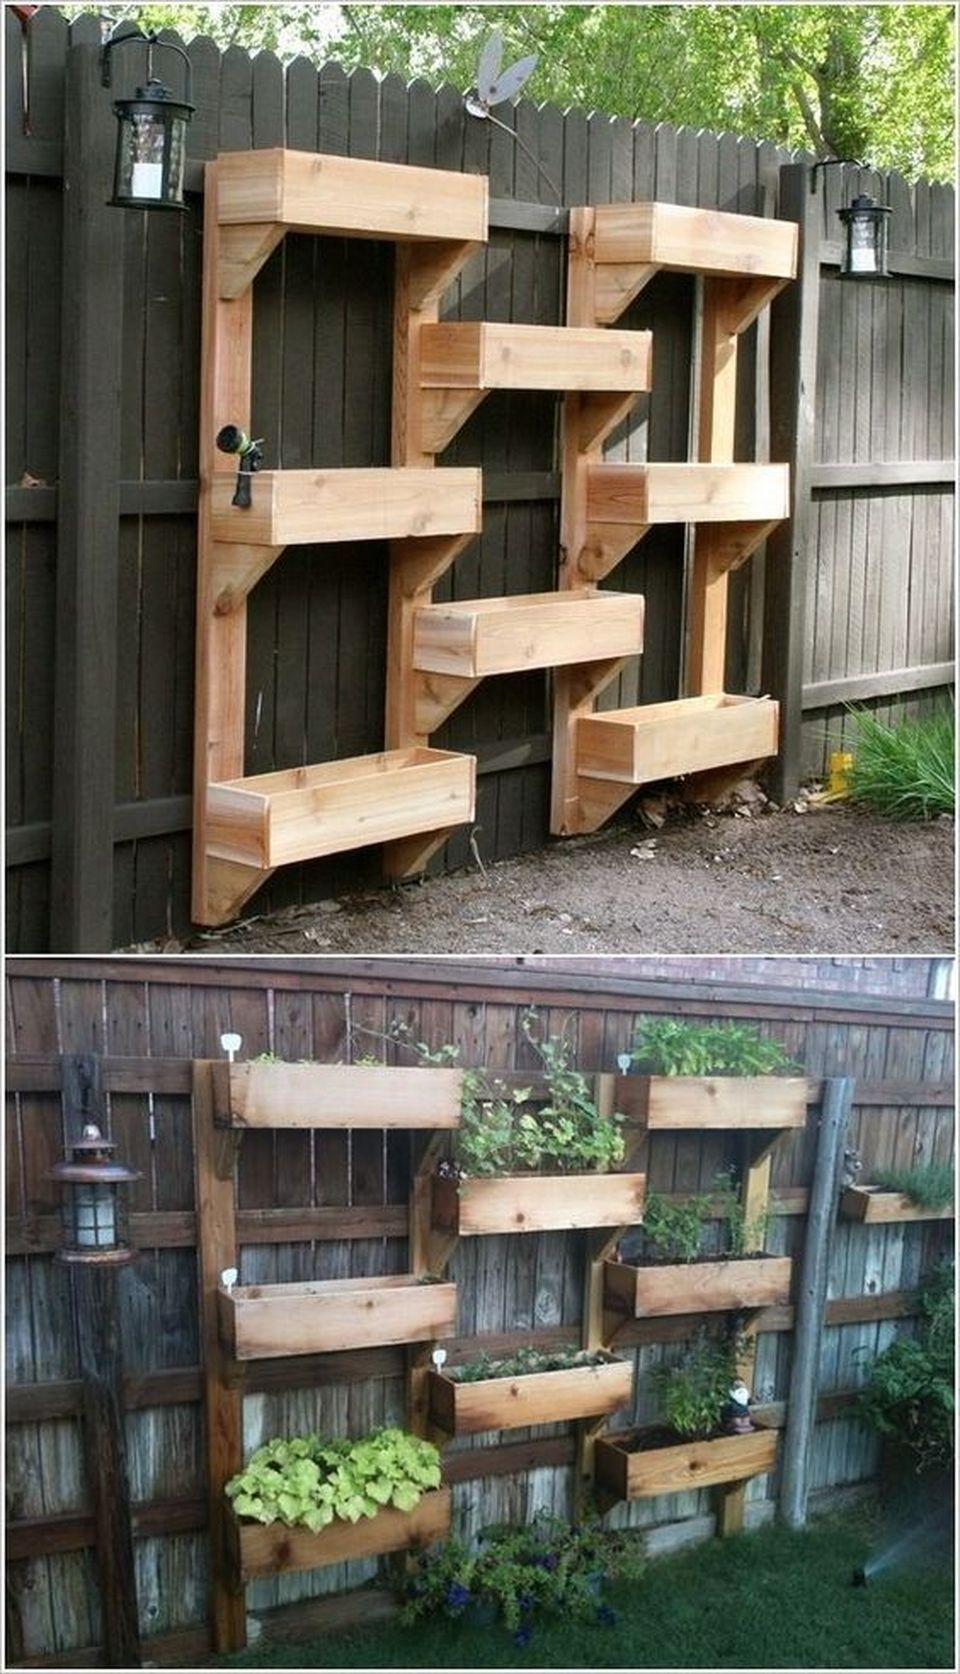 Amazing Creative Wood Pallet Garden Project 48 Small Backyard Landscaping Backyard Vertical Garden